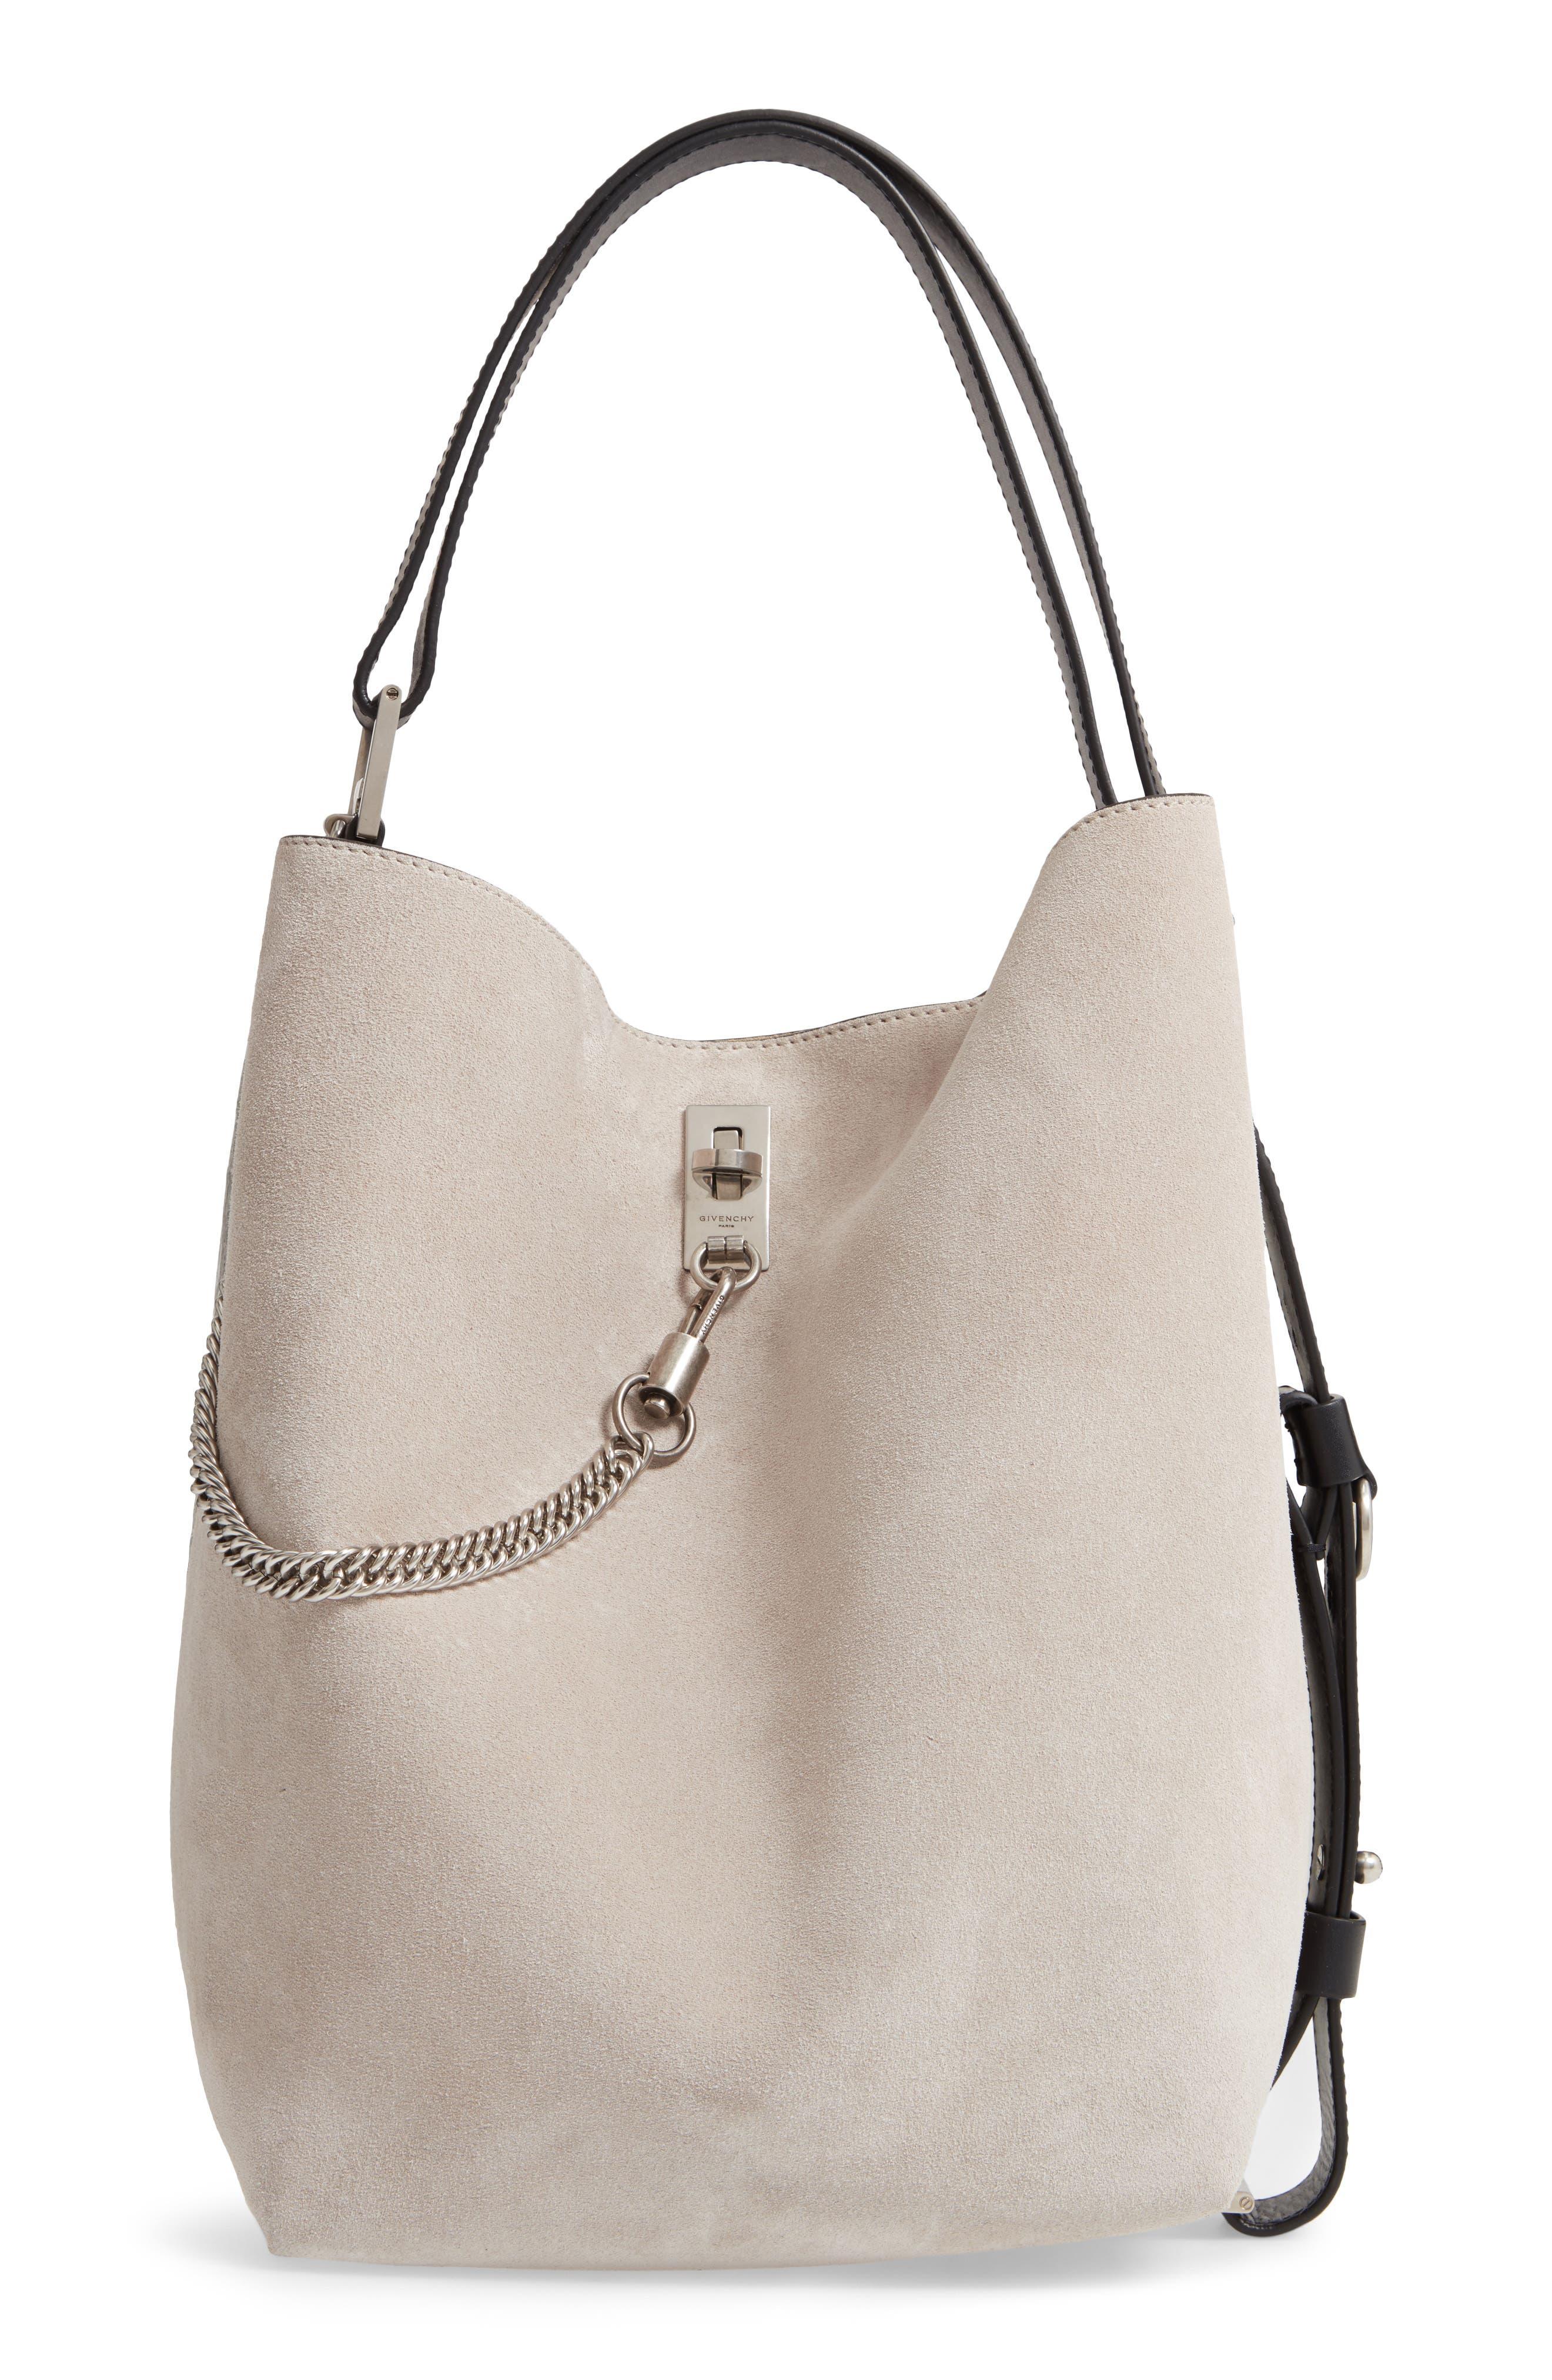 GIVENCHY, Medium GV Calfskin Suede Bucket Bag, Main thumbnail 1, color, NATURAL/ SILVER